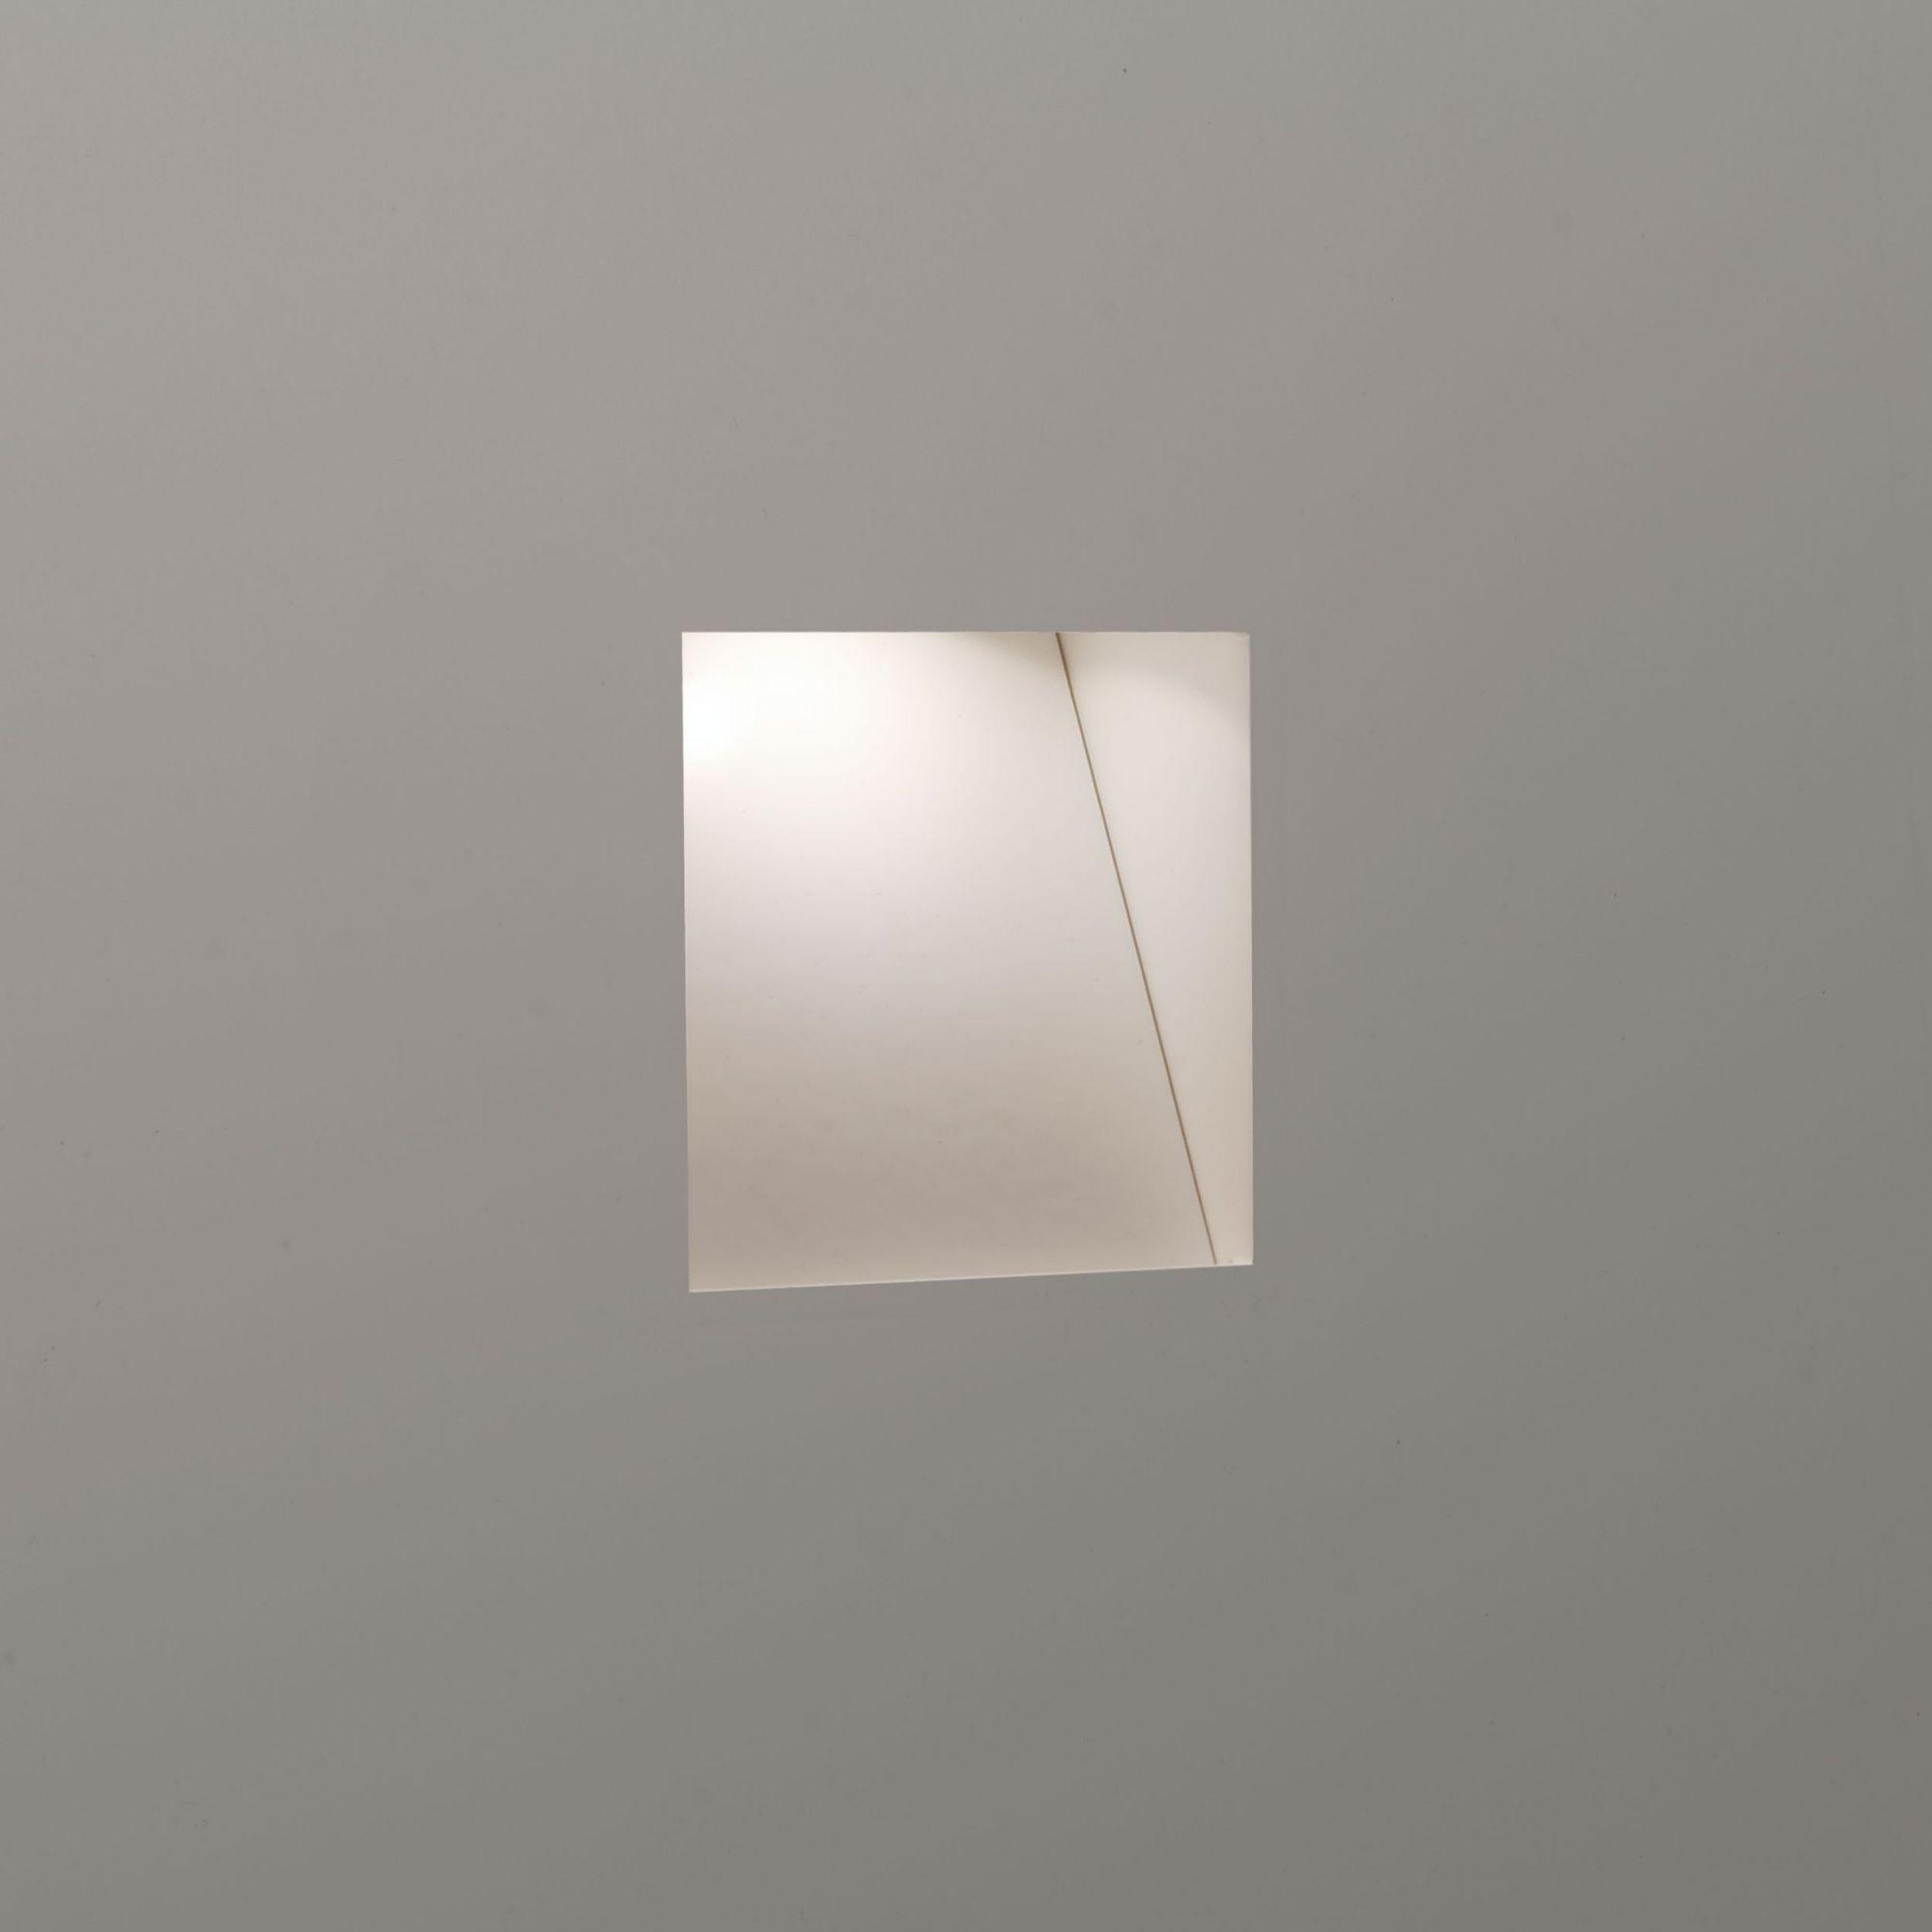 Lampa schodowa Borgo Trimless Mini LED 7566 Astro Lighting